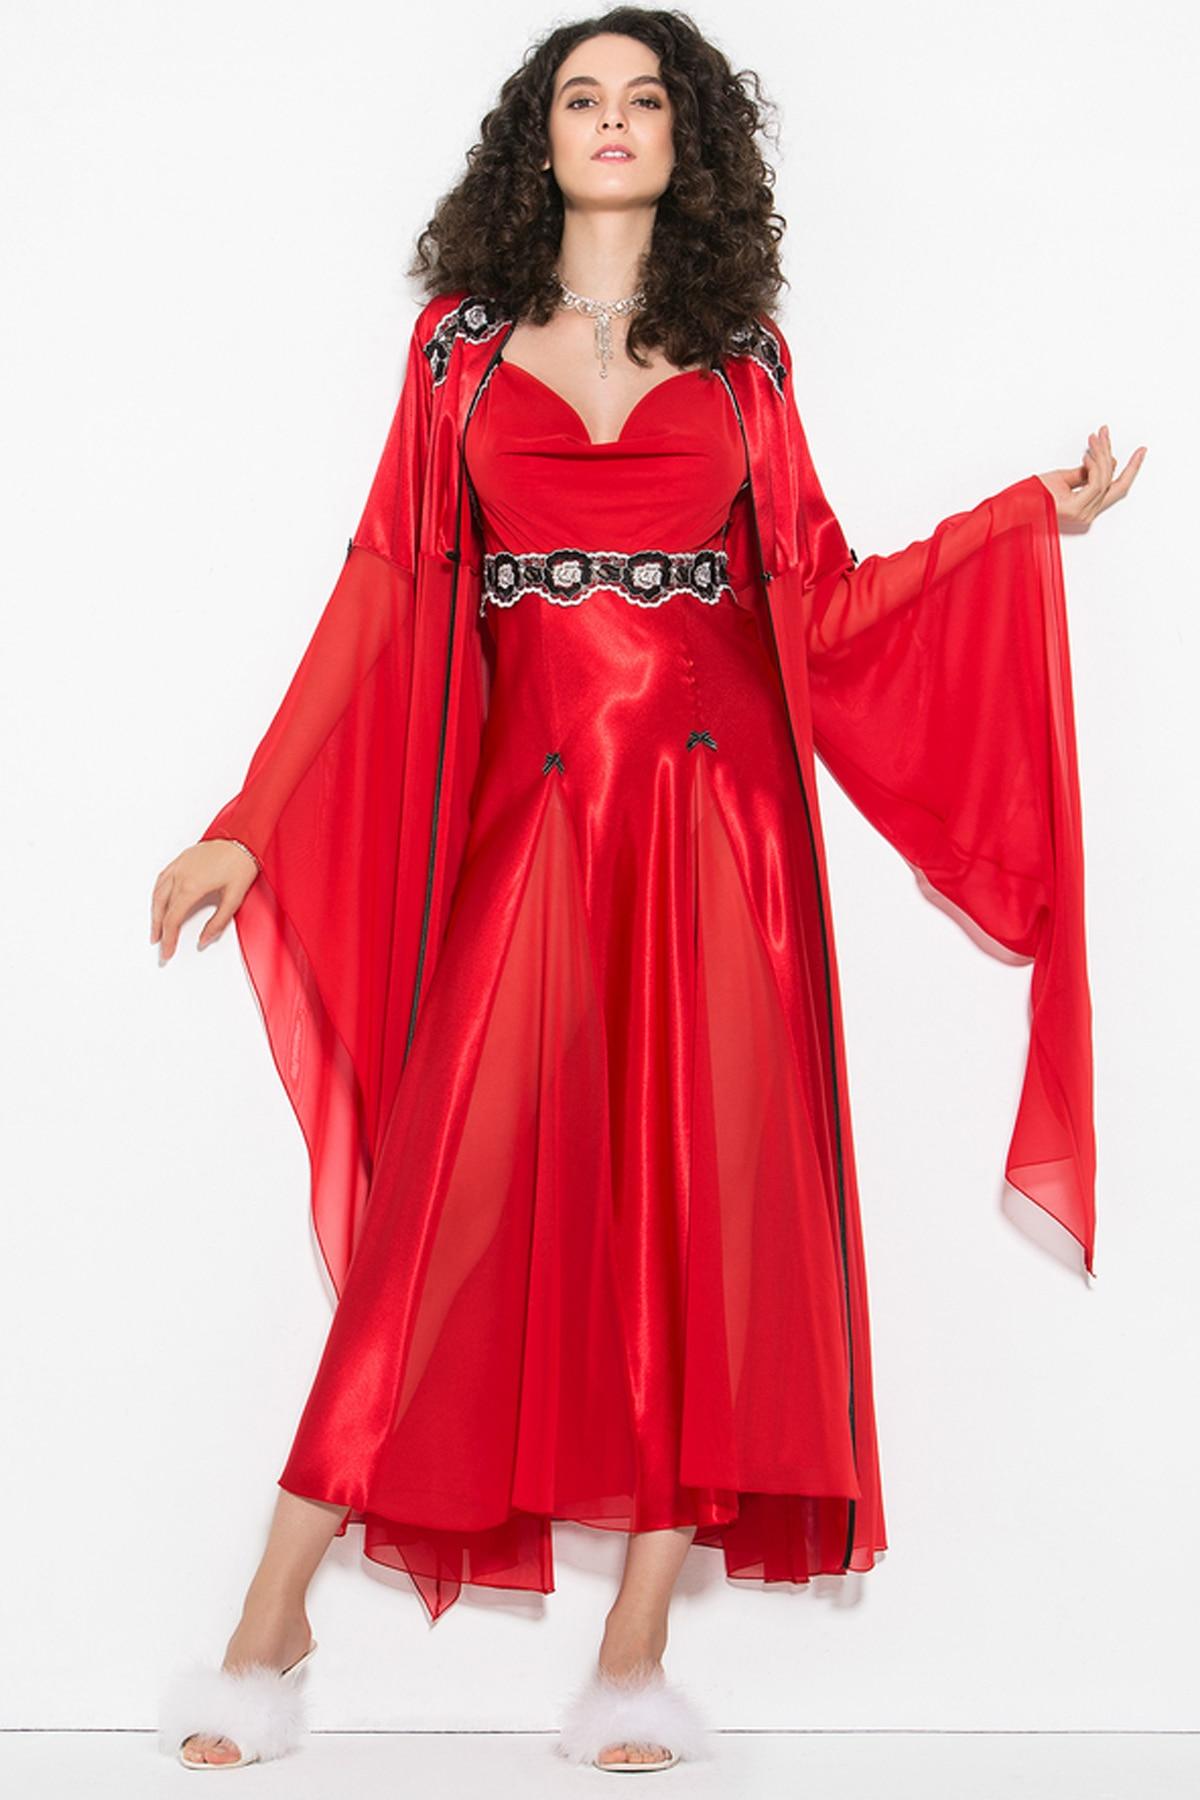 Far Drams 5502 Kadi Silk Satin Wide Sleeve Long Comfortable Night Wear At Home Cool Warm 2 Piece Nightgown Dressing Gown